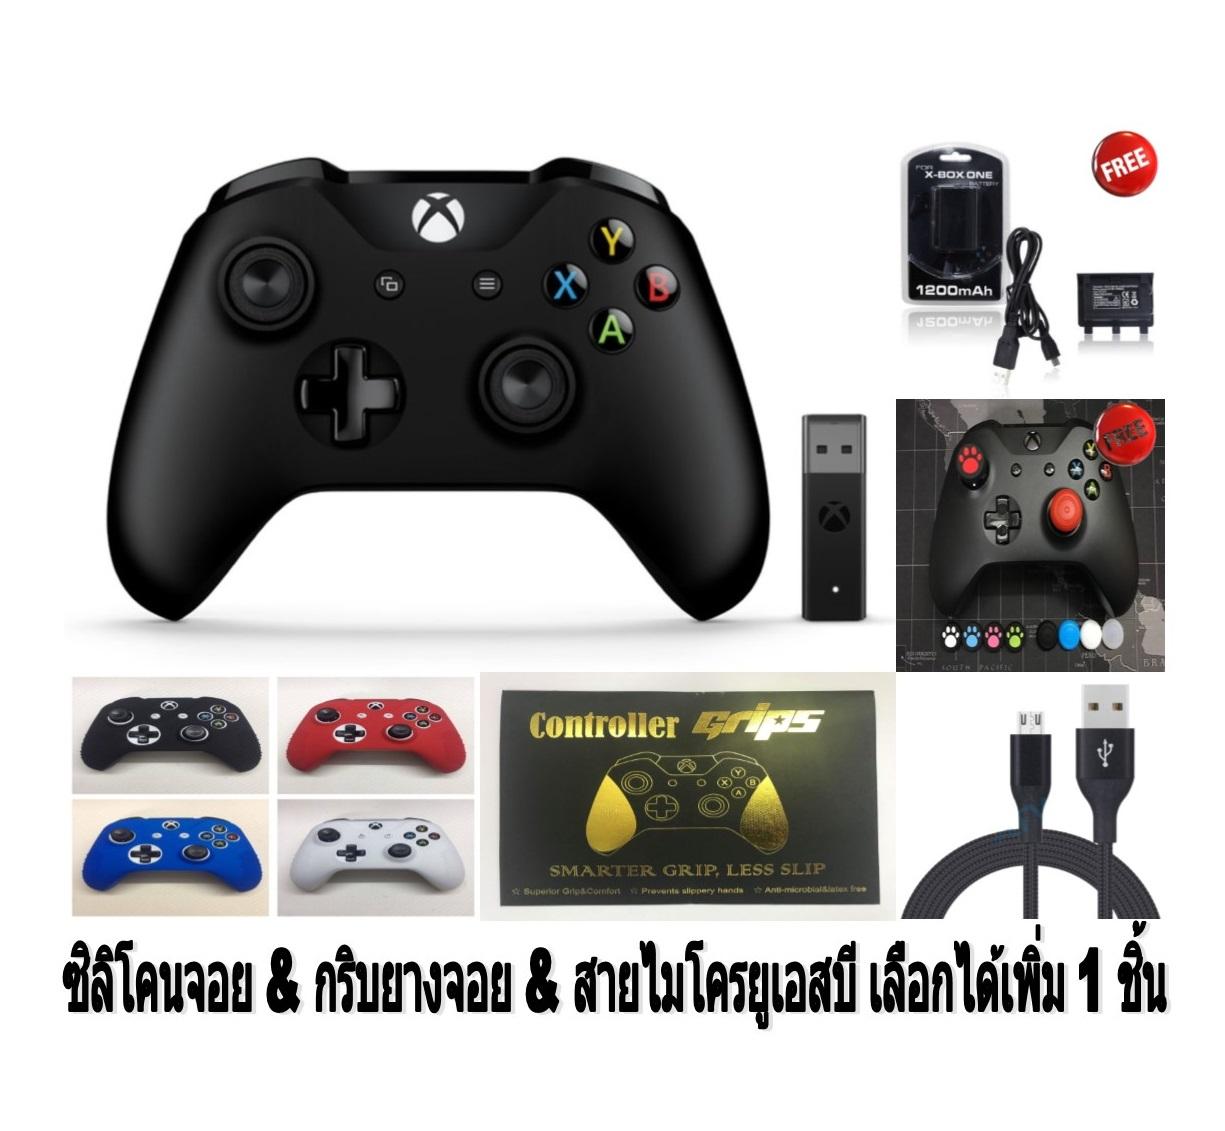 Set Xbox One S Controller + New Adapter for Windows - Black (Gen 3) (Wireless & Bluetooth) (Warranty 3 Month)